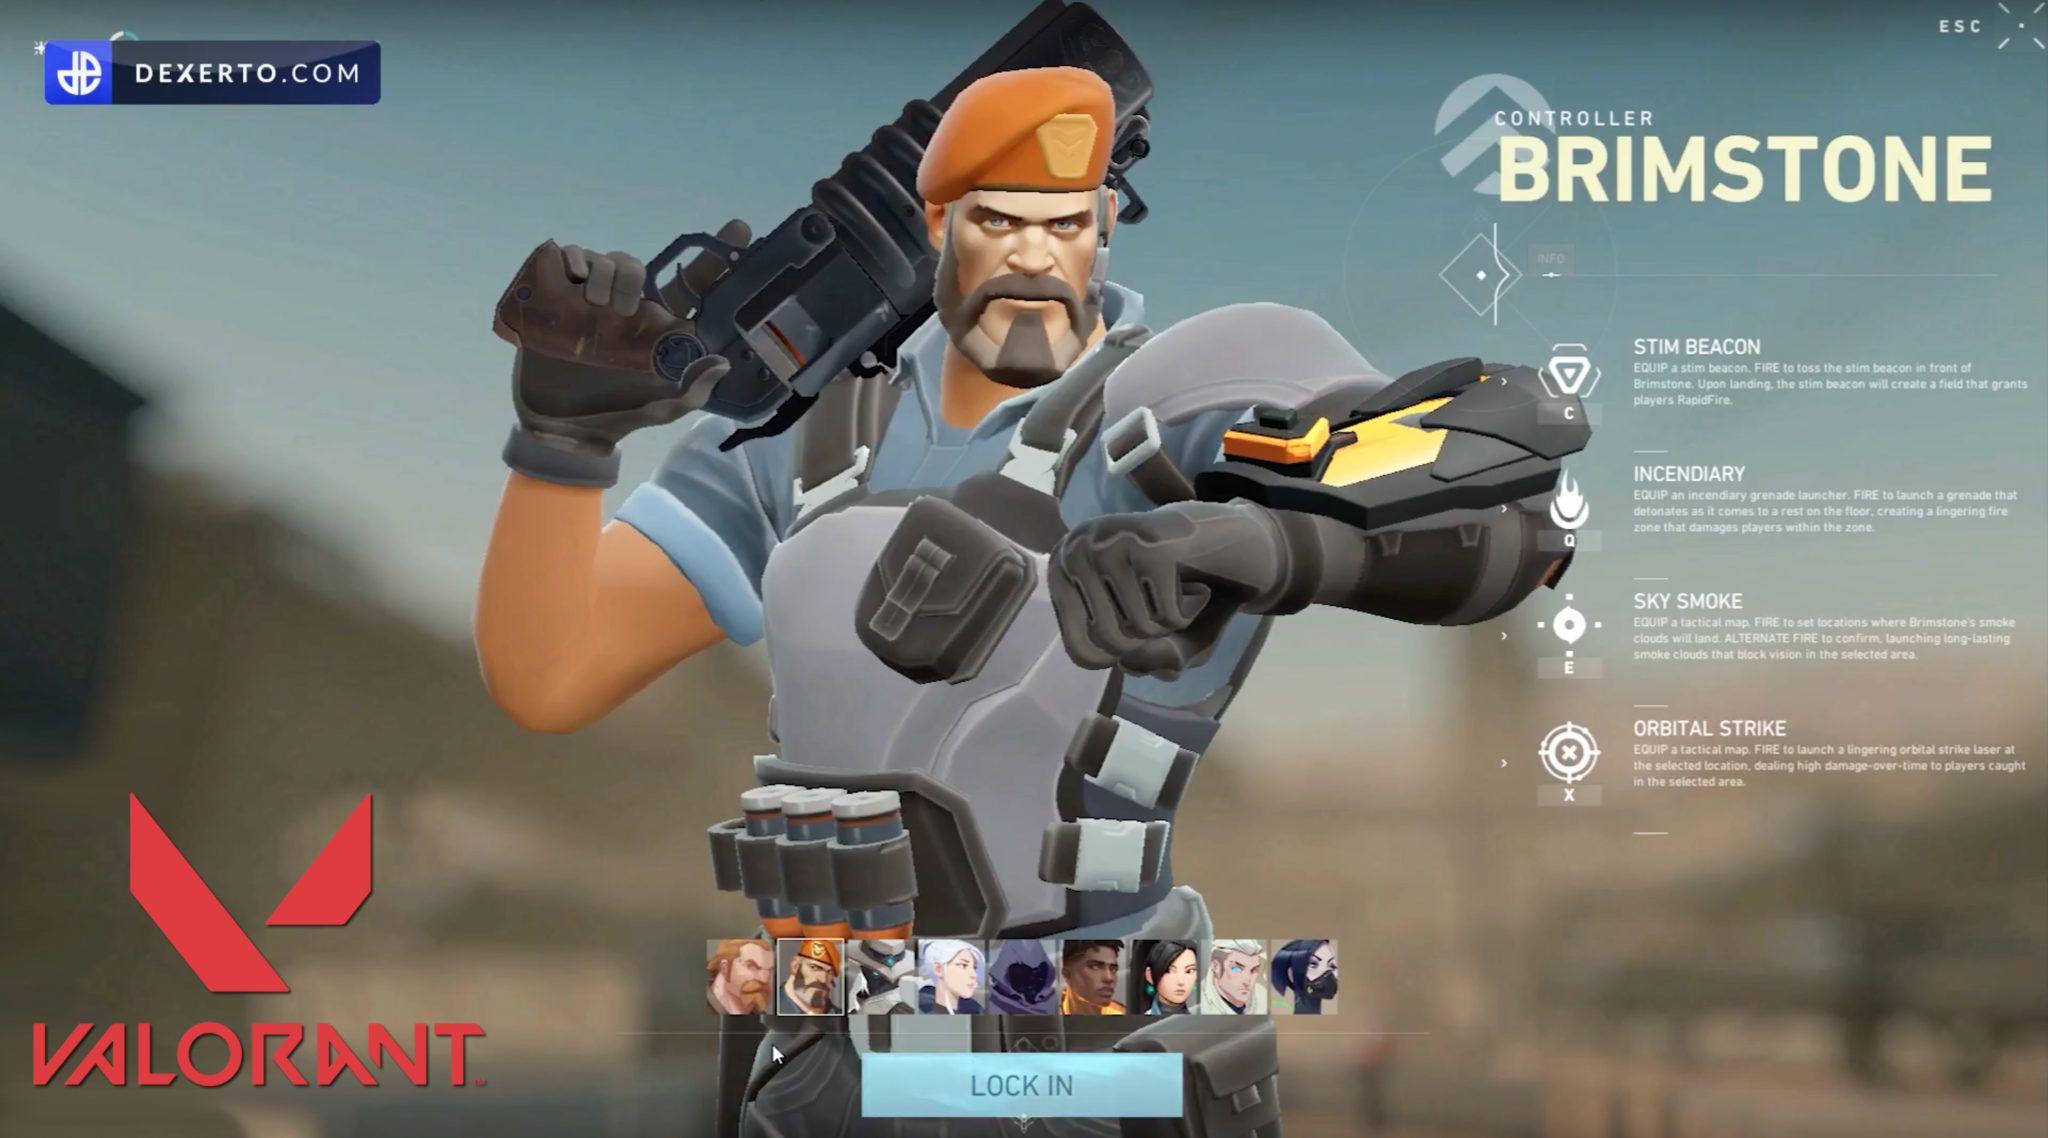 Valorant Brimstone Riot Games Dexerto